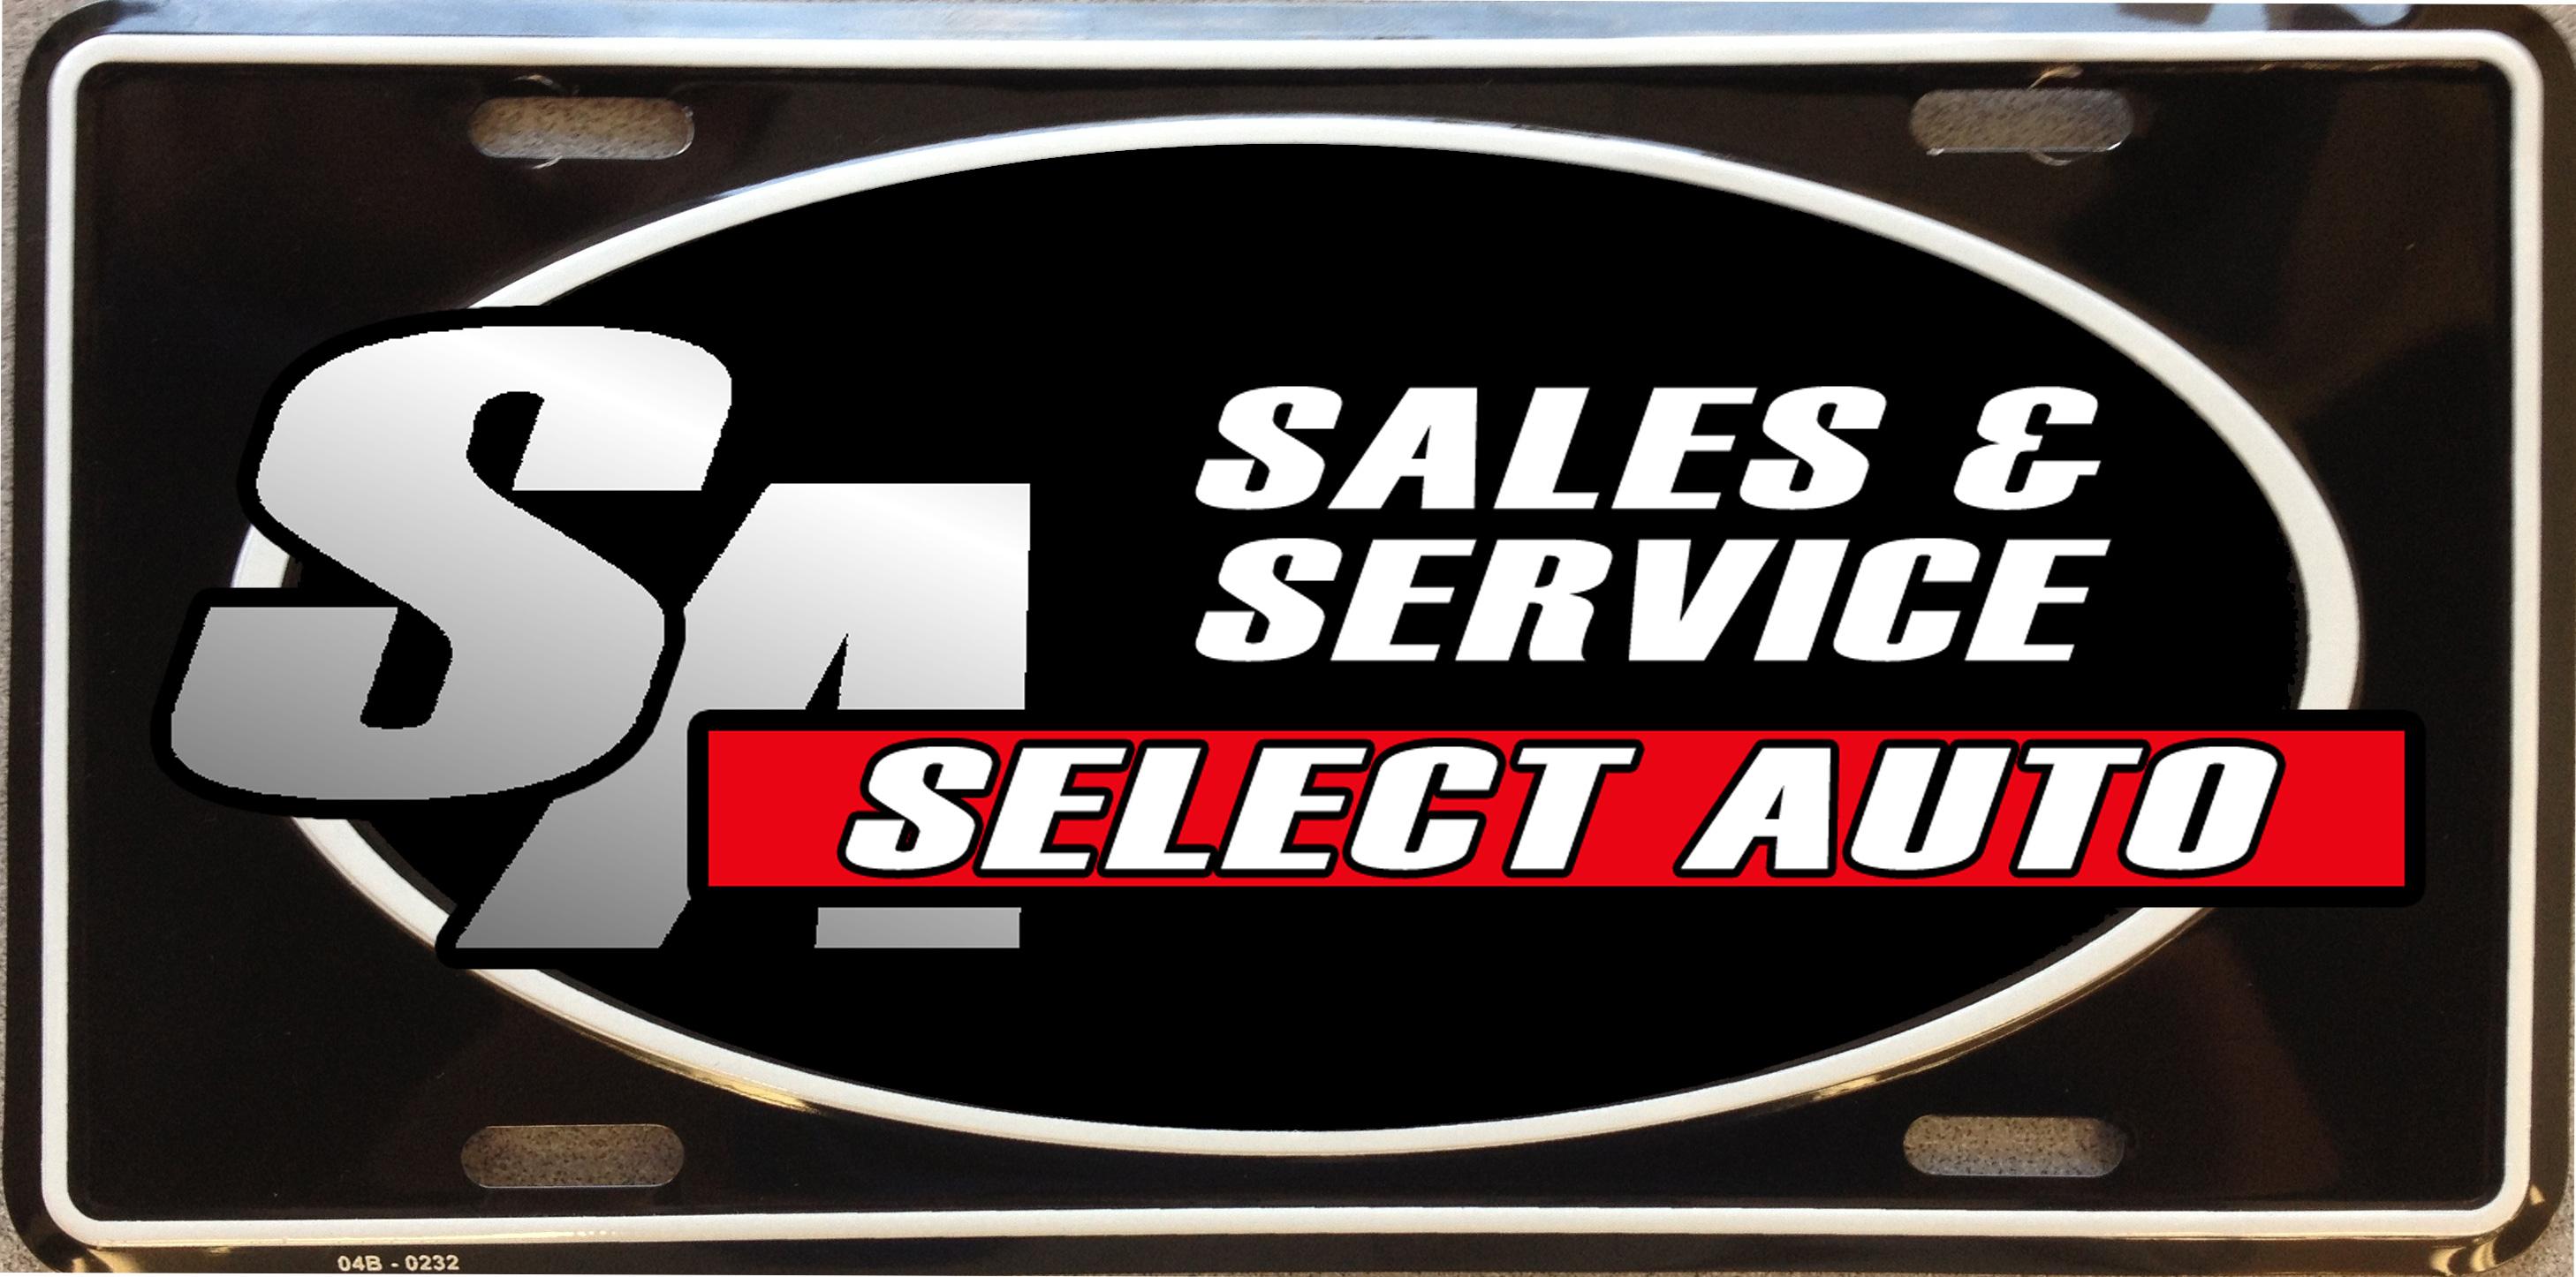 Auto select coupons